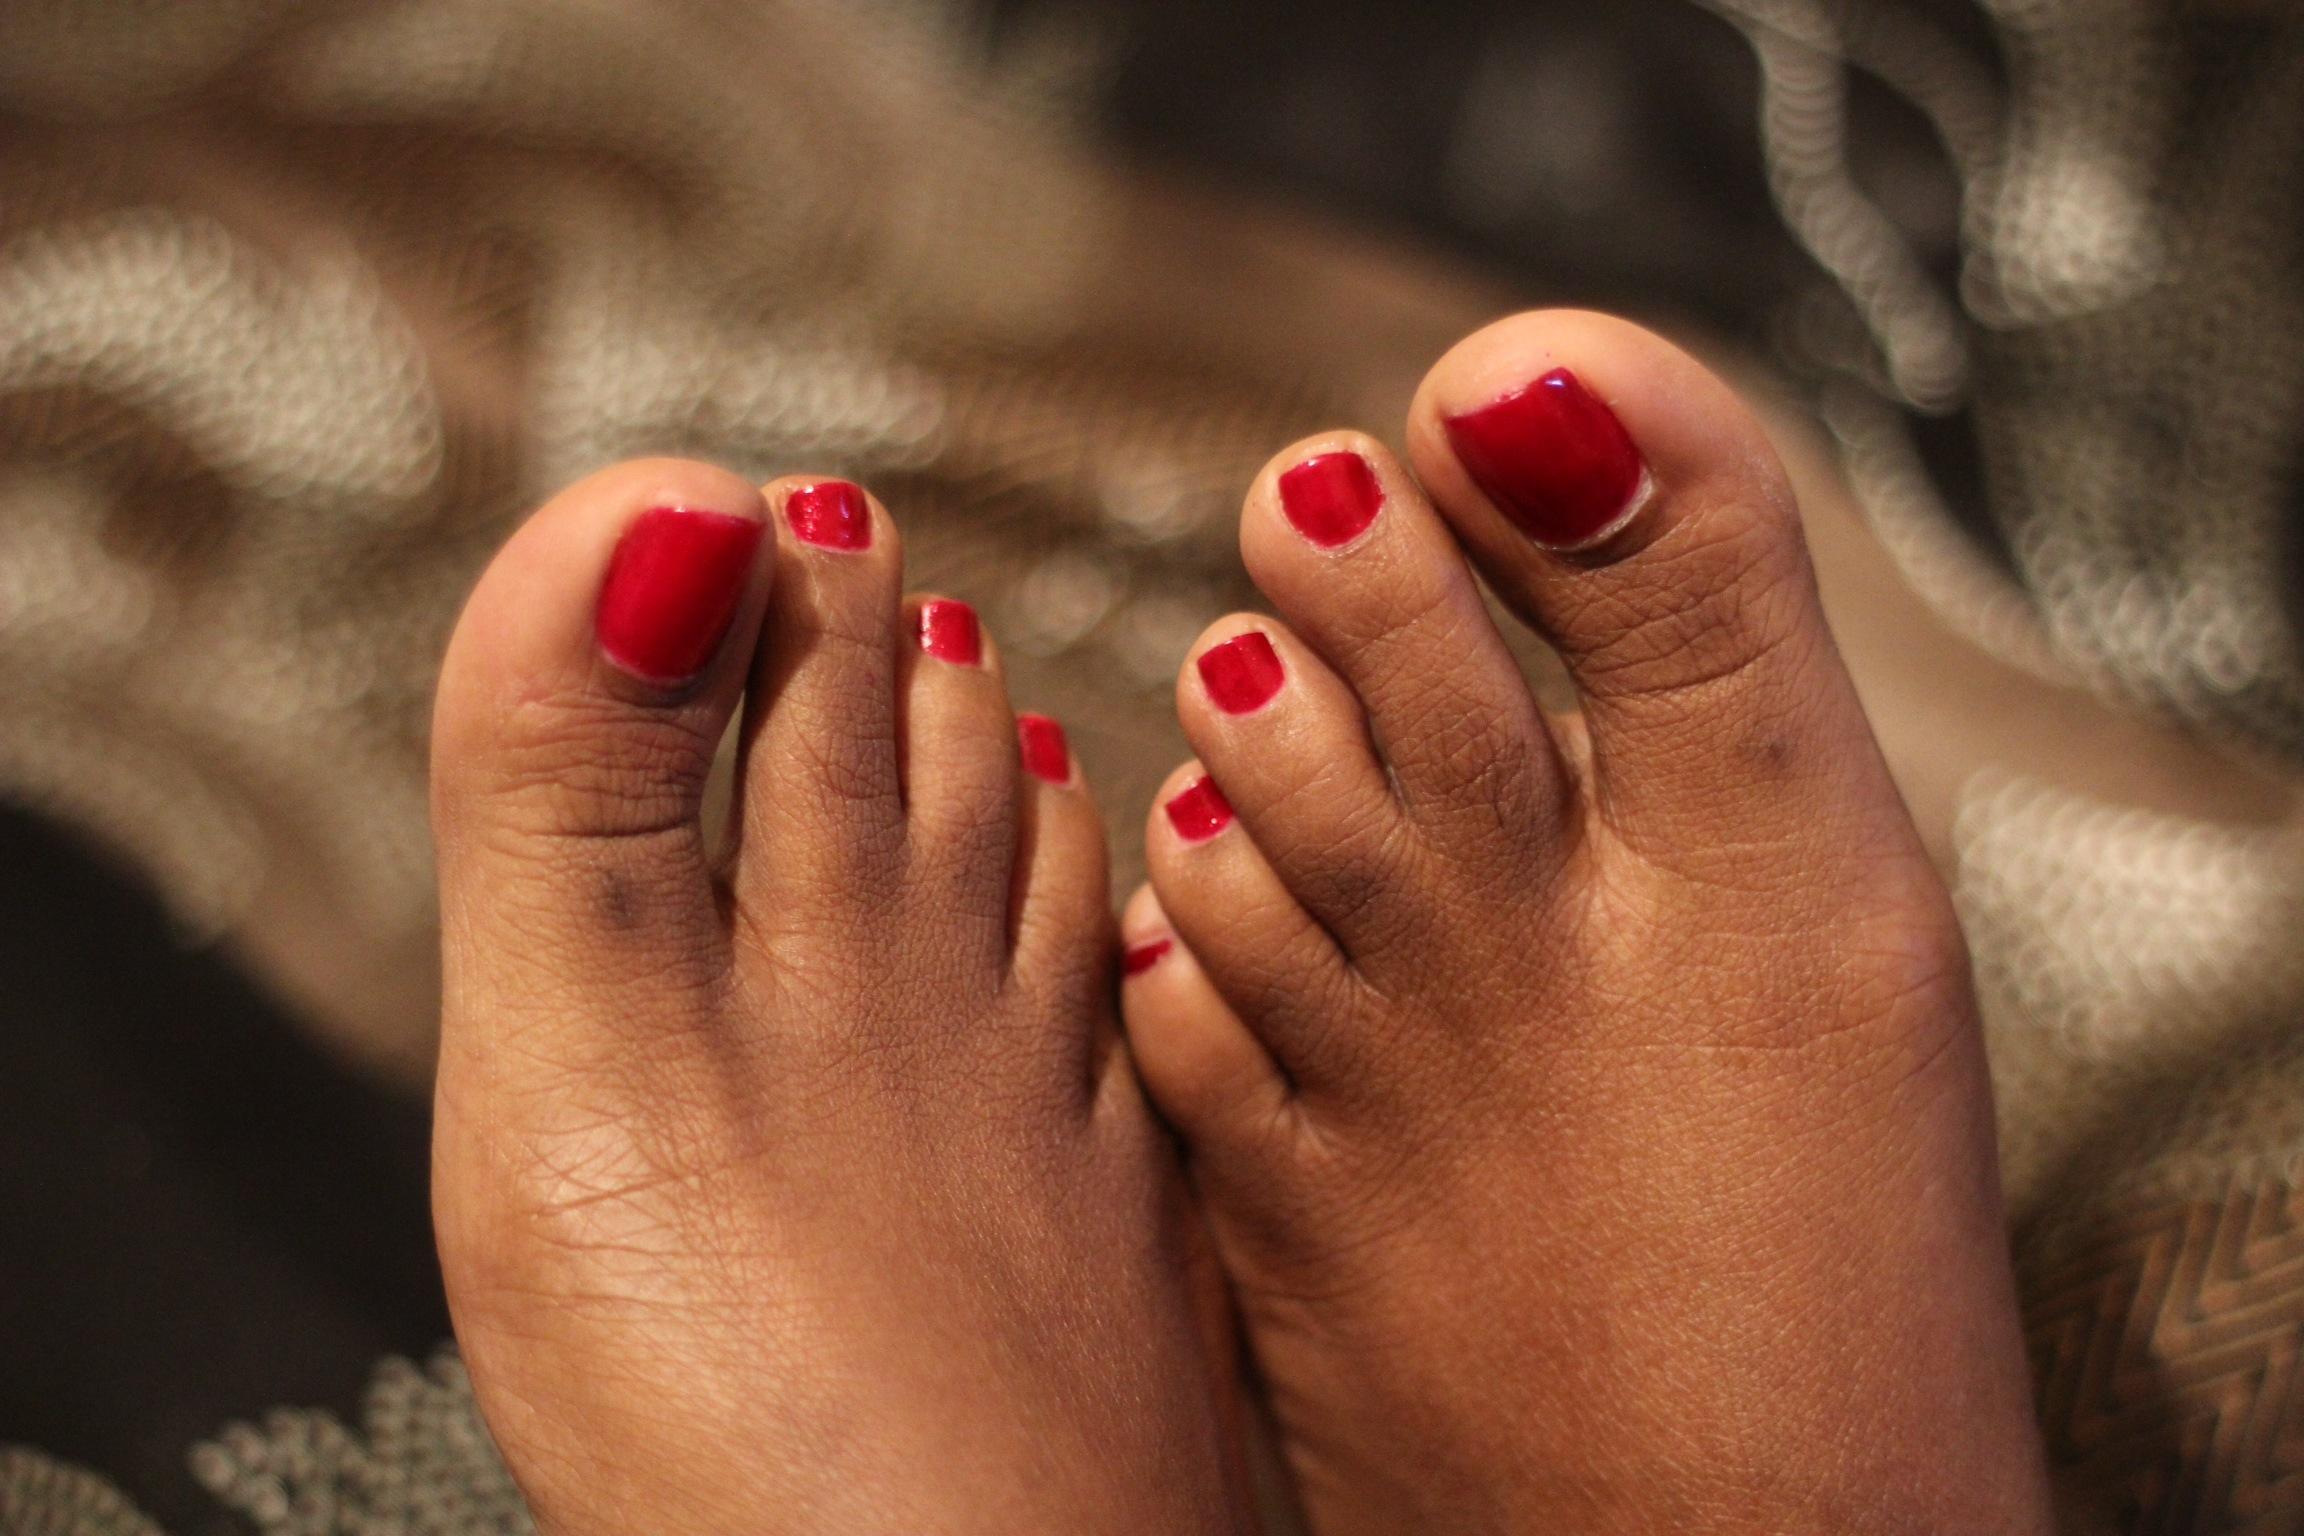 Фото пальчиков на ножках, индивидуалка вика в хабаровске